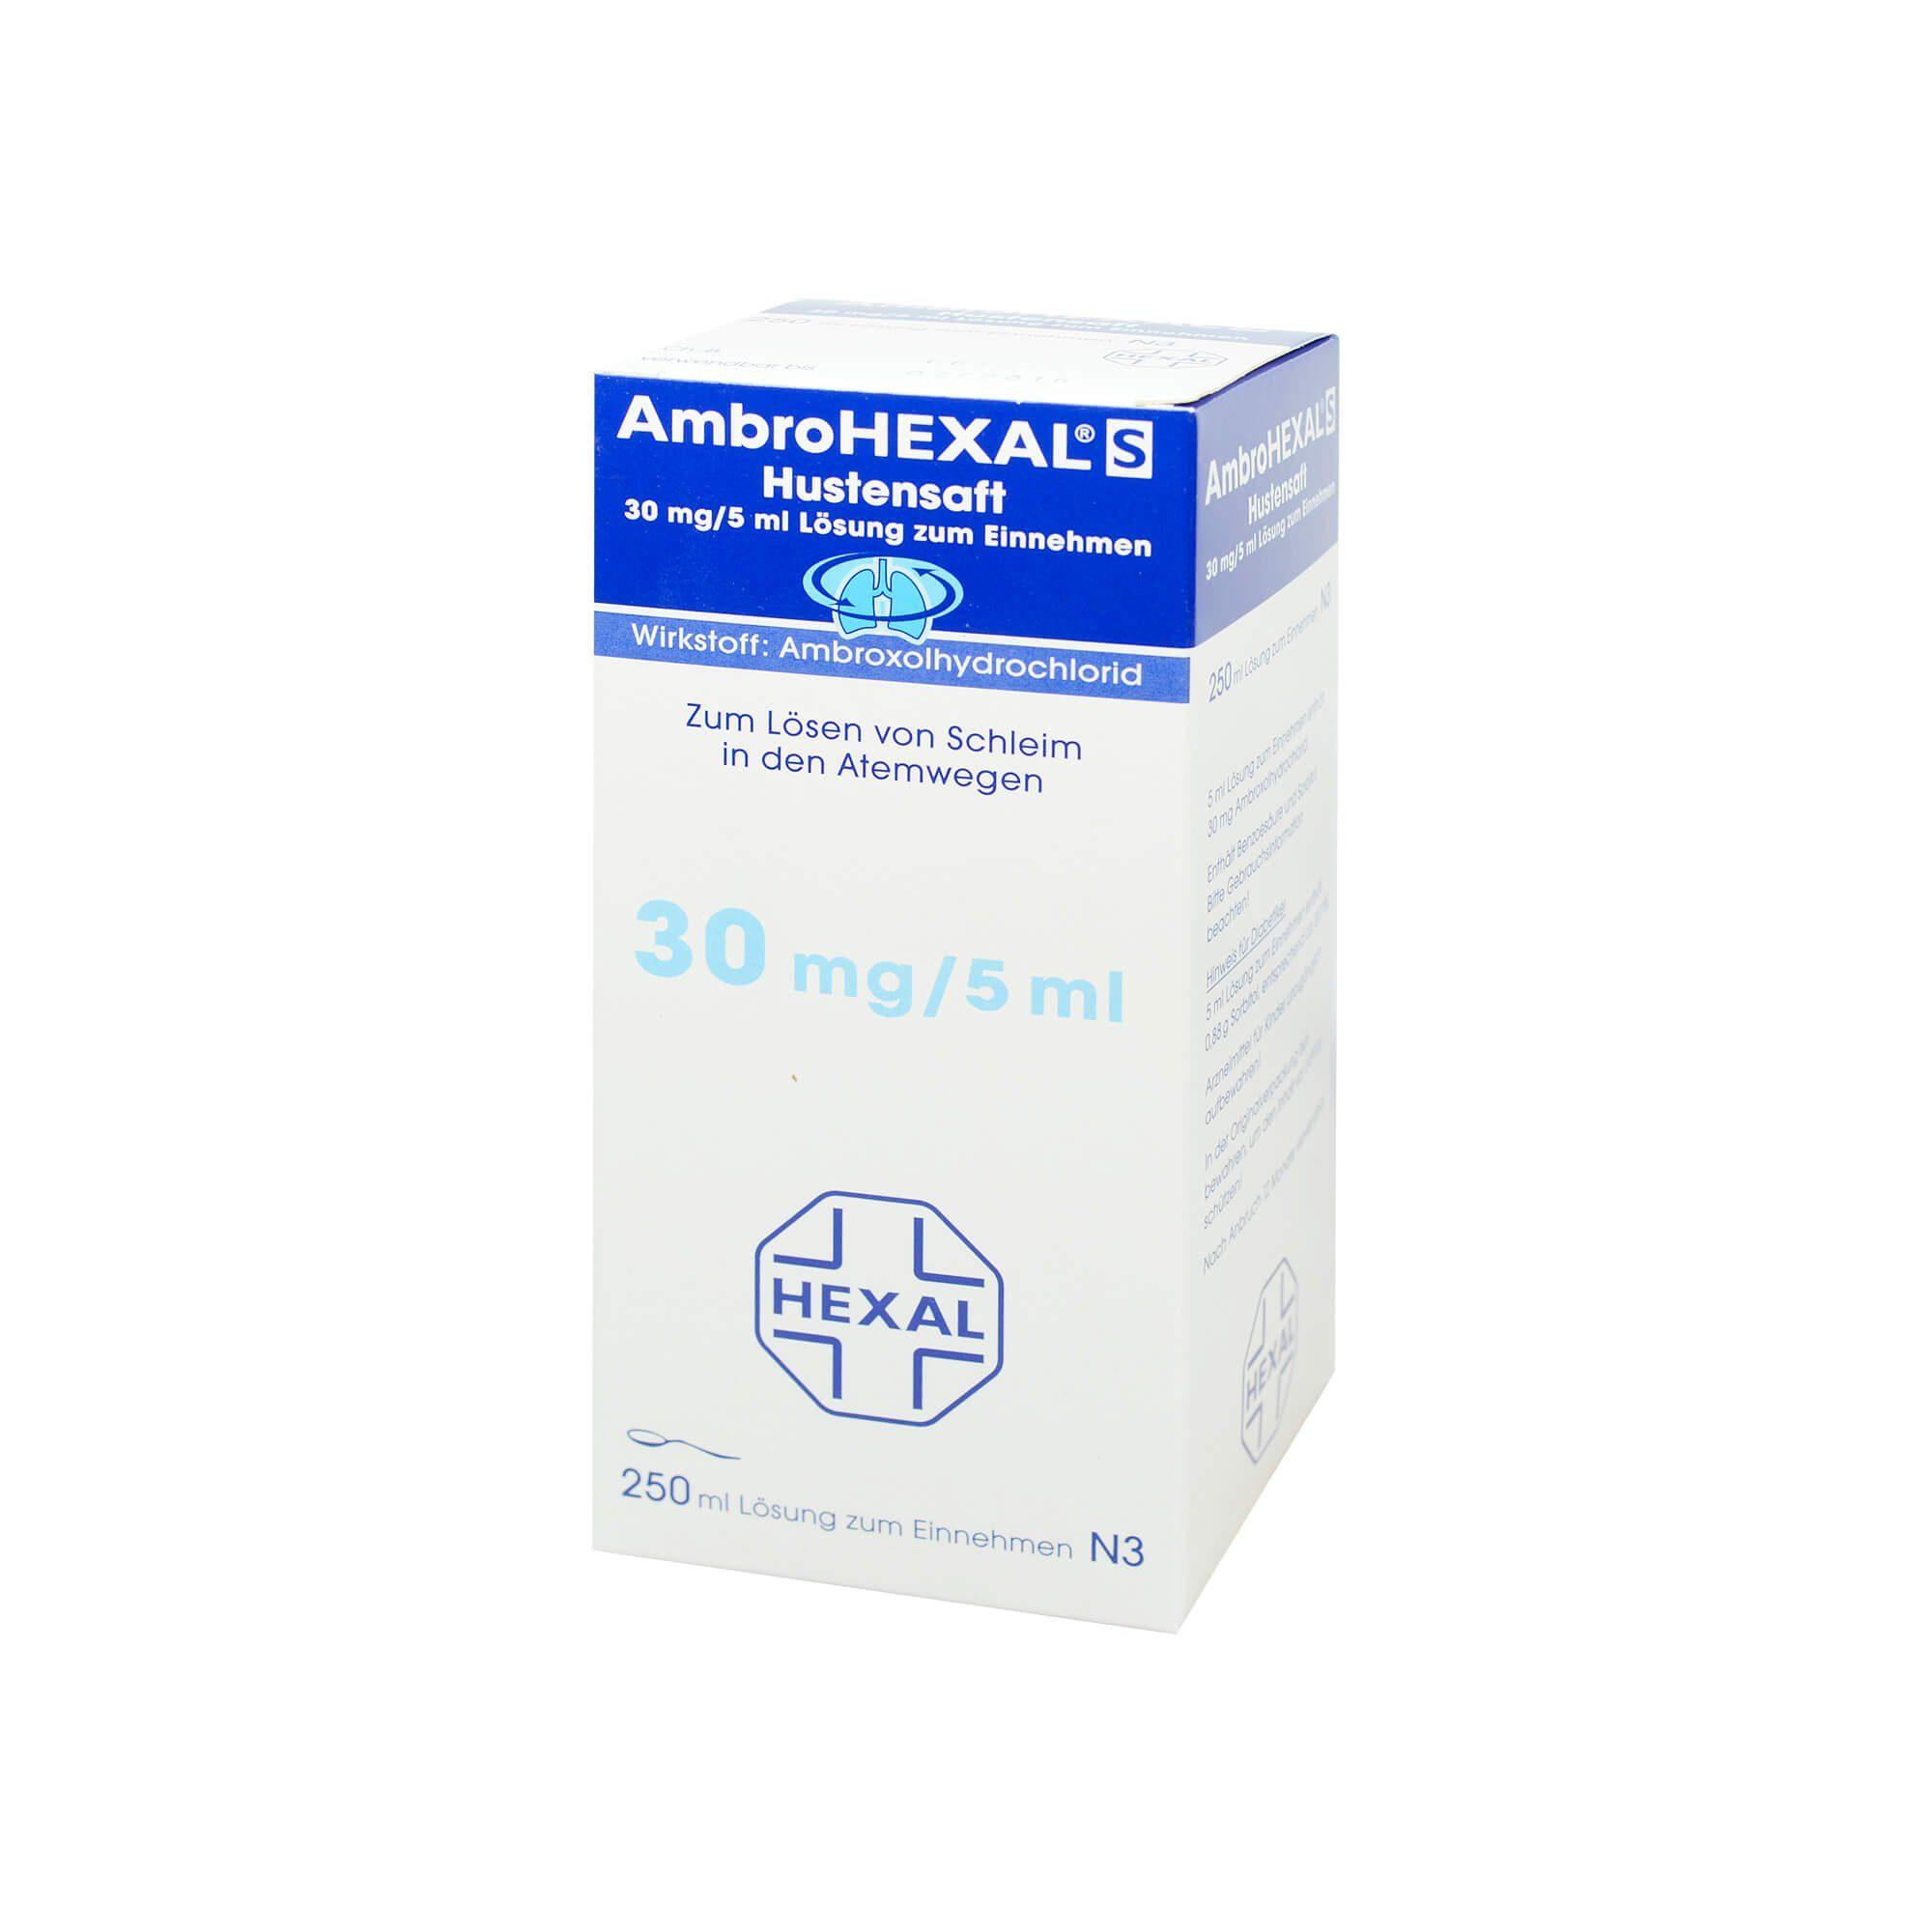 Hexal AmbroHEXAL S Hustensaft 30 mg/5 ml , 250 ml